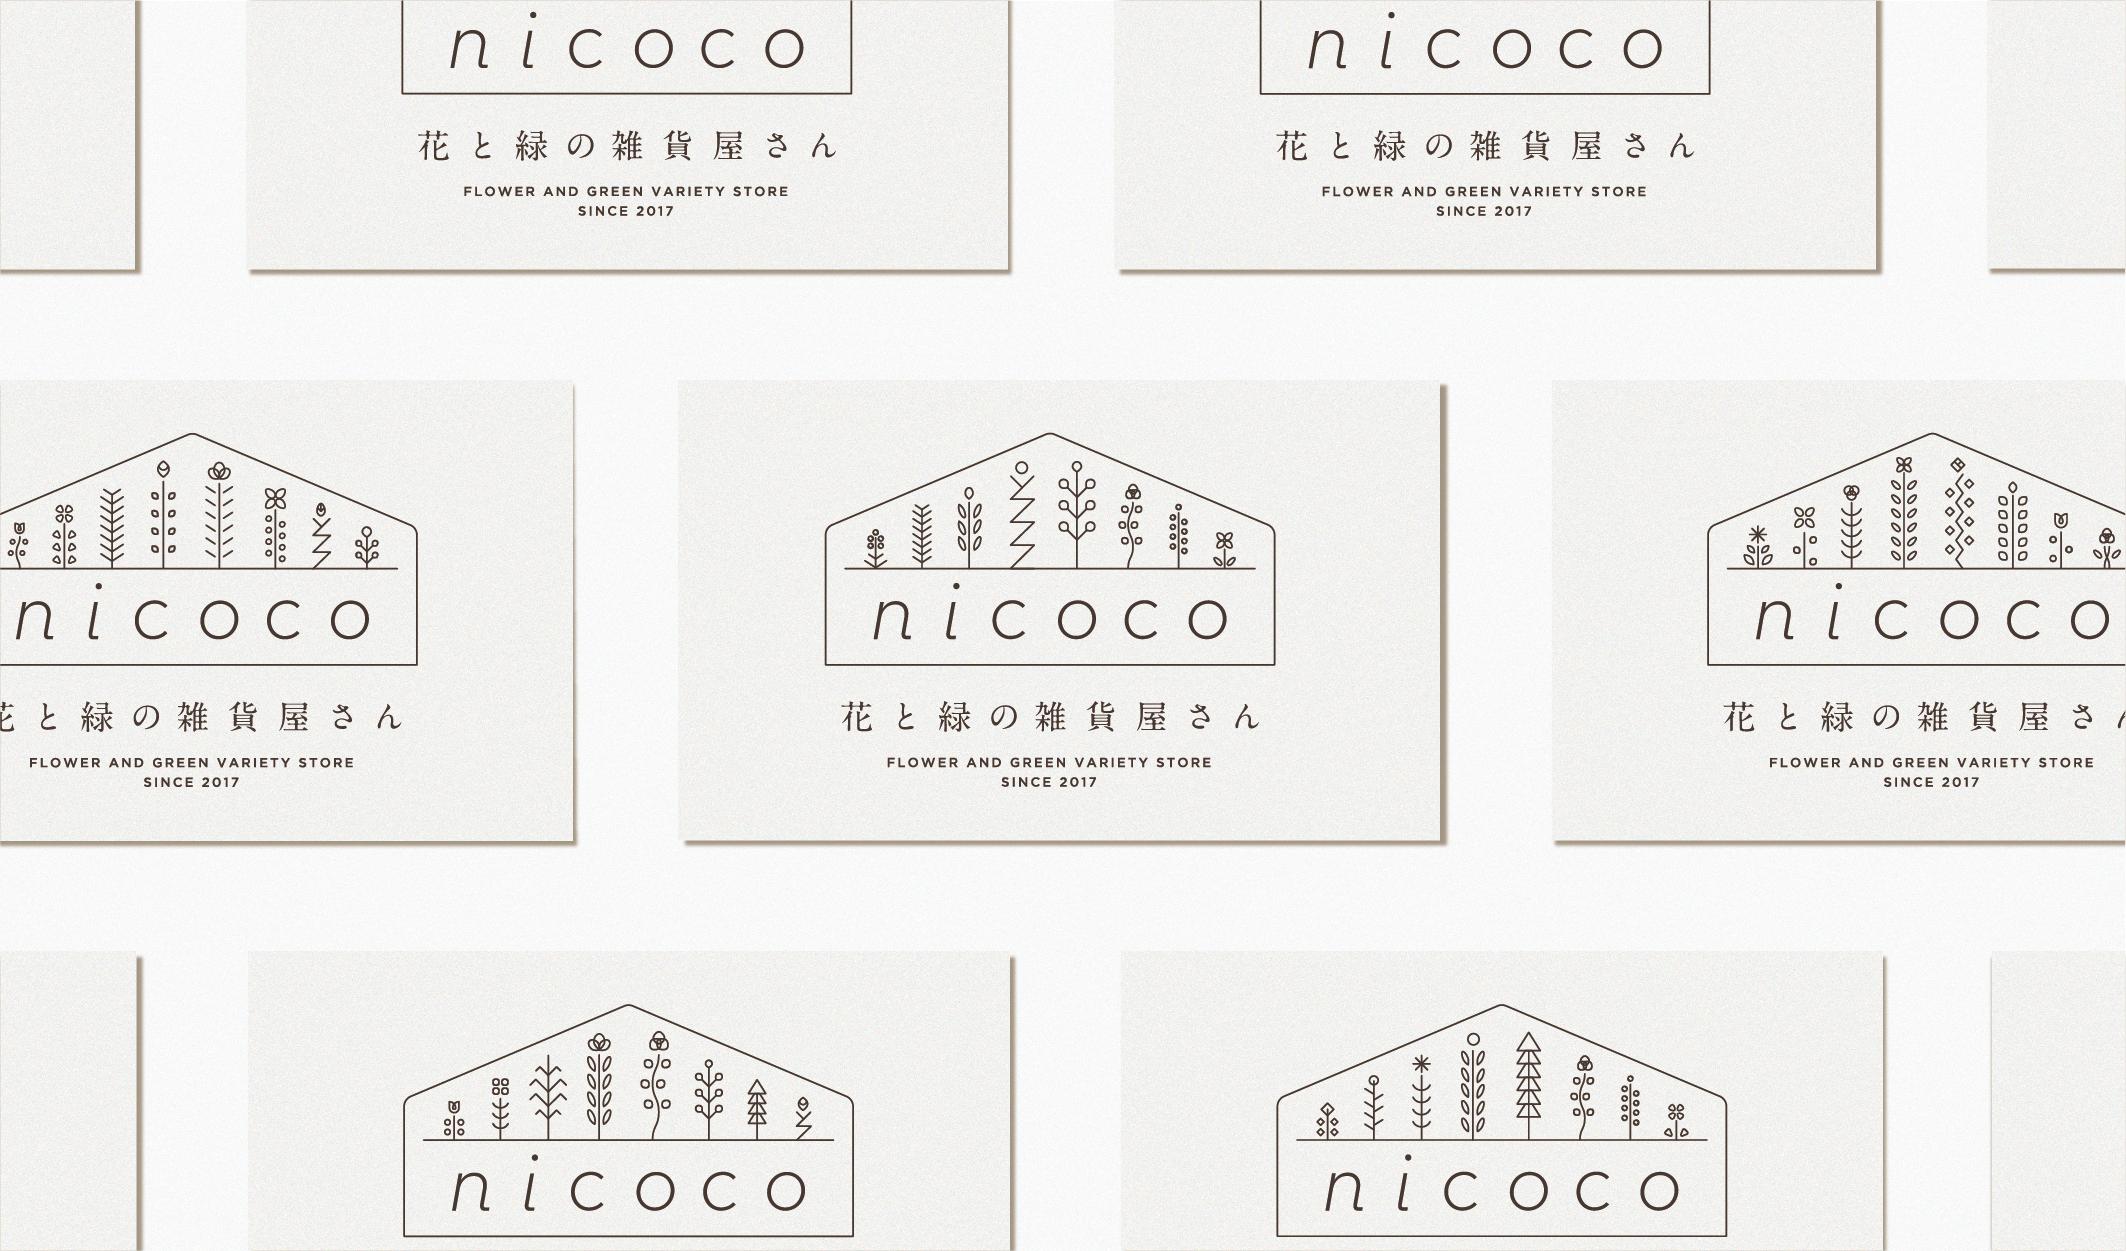 nicoco image3